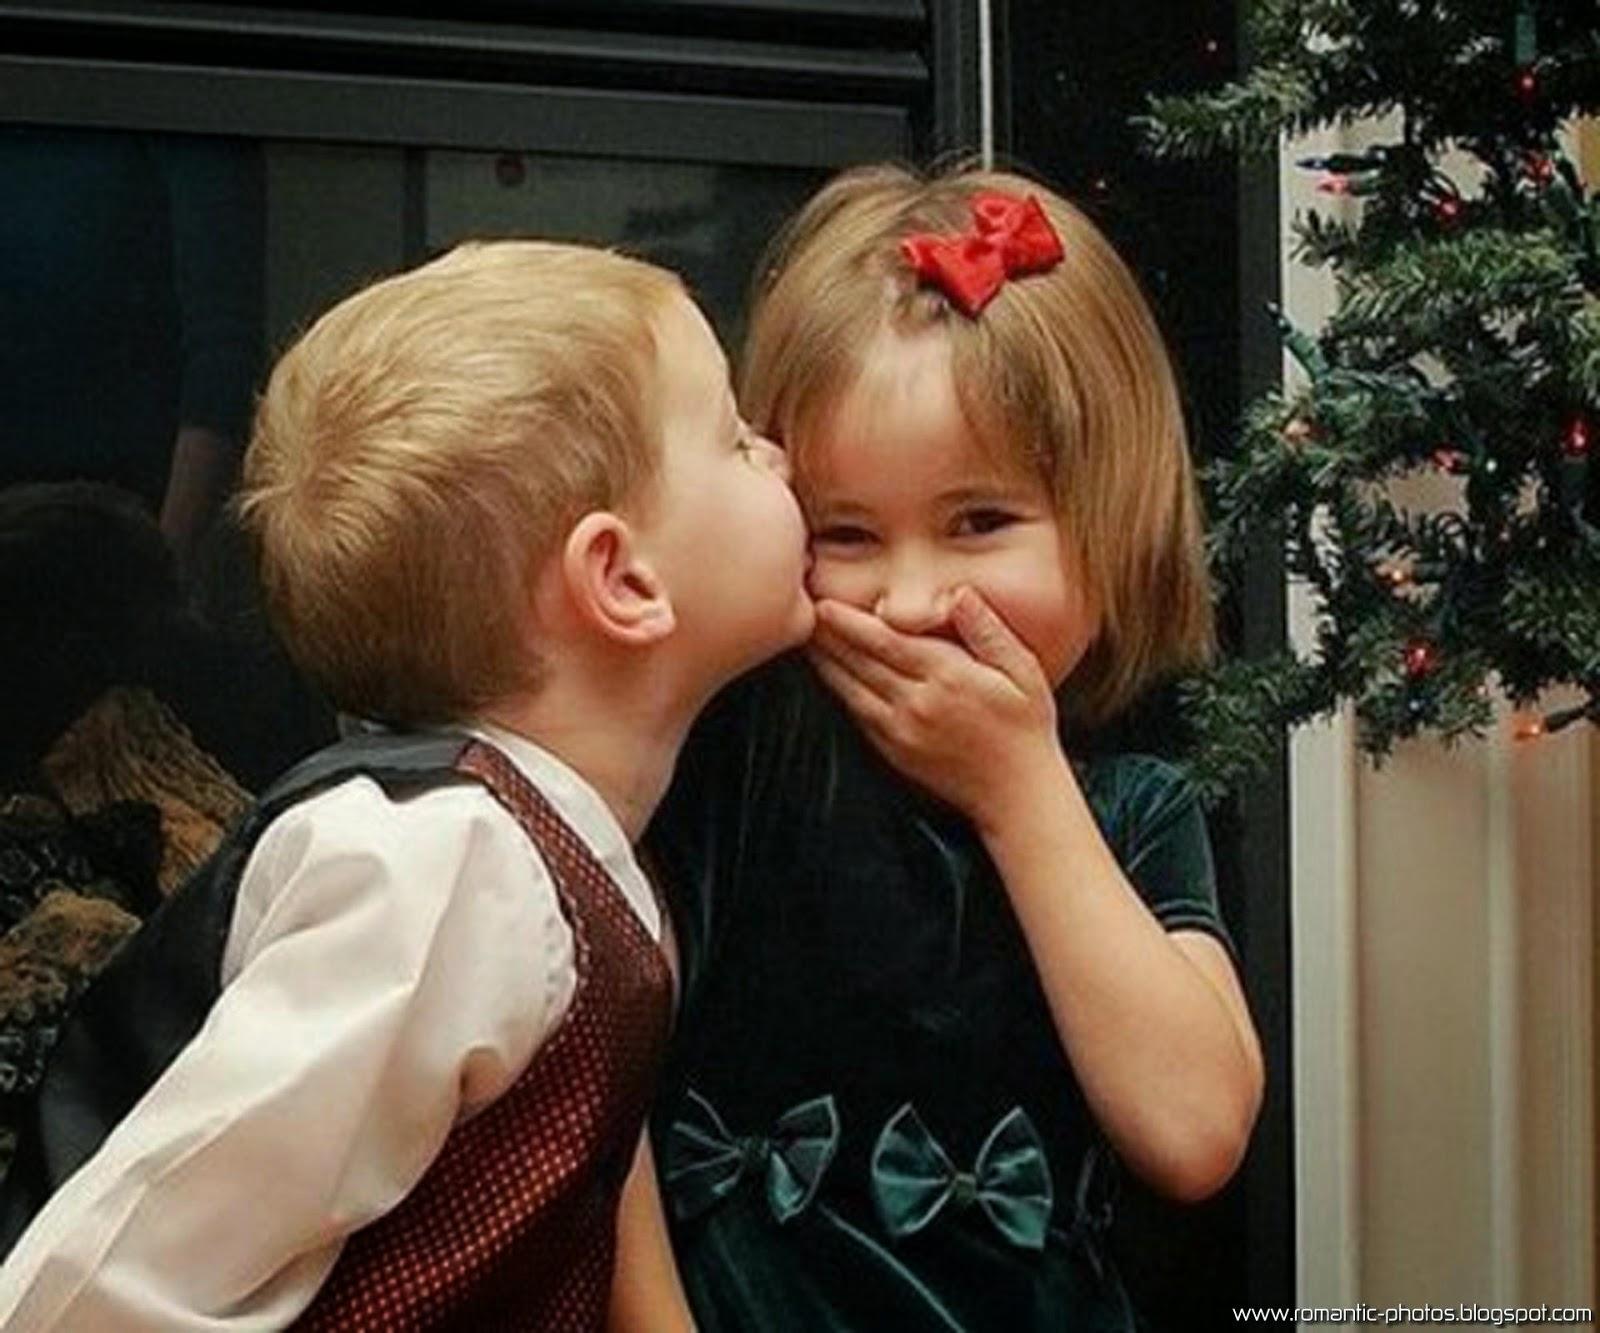 بالصور صور رومانسيه للاطفال , اجمل اطفال نايس 1675 5